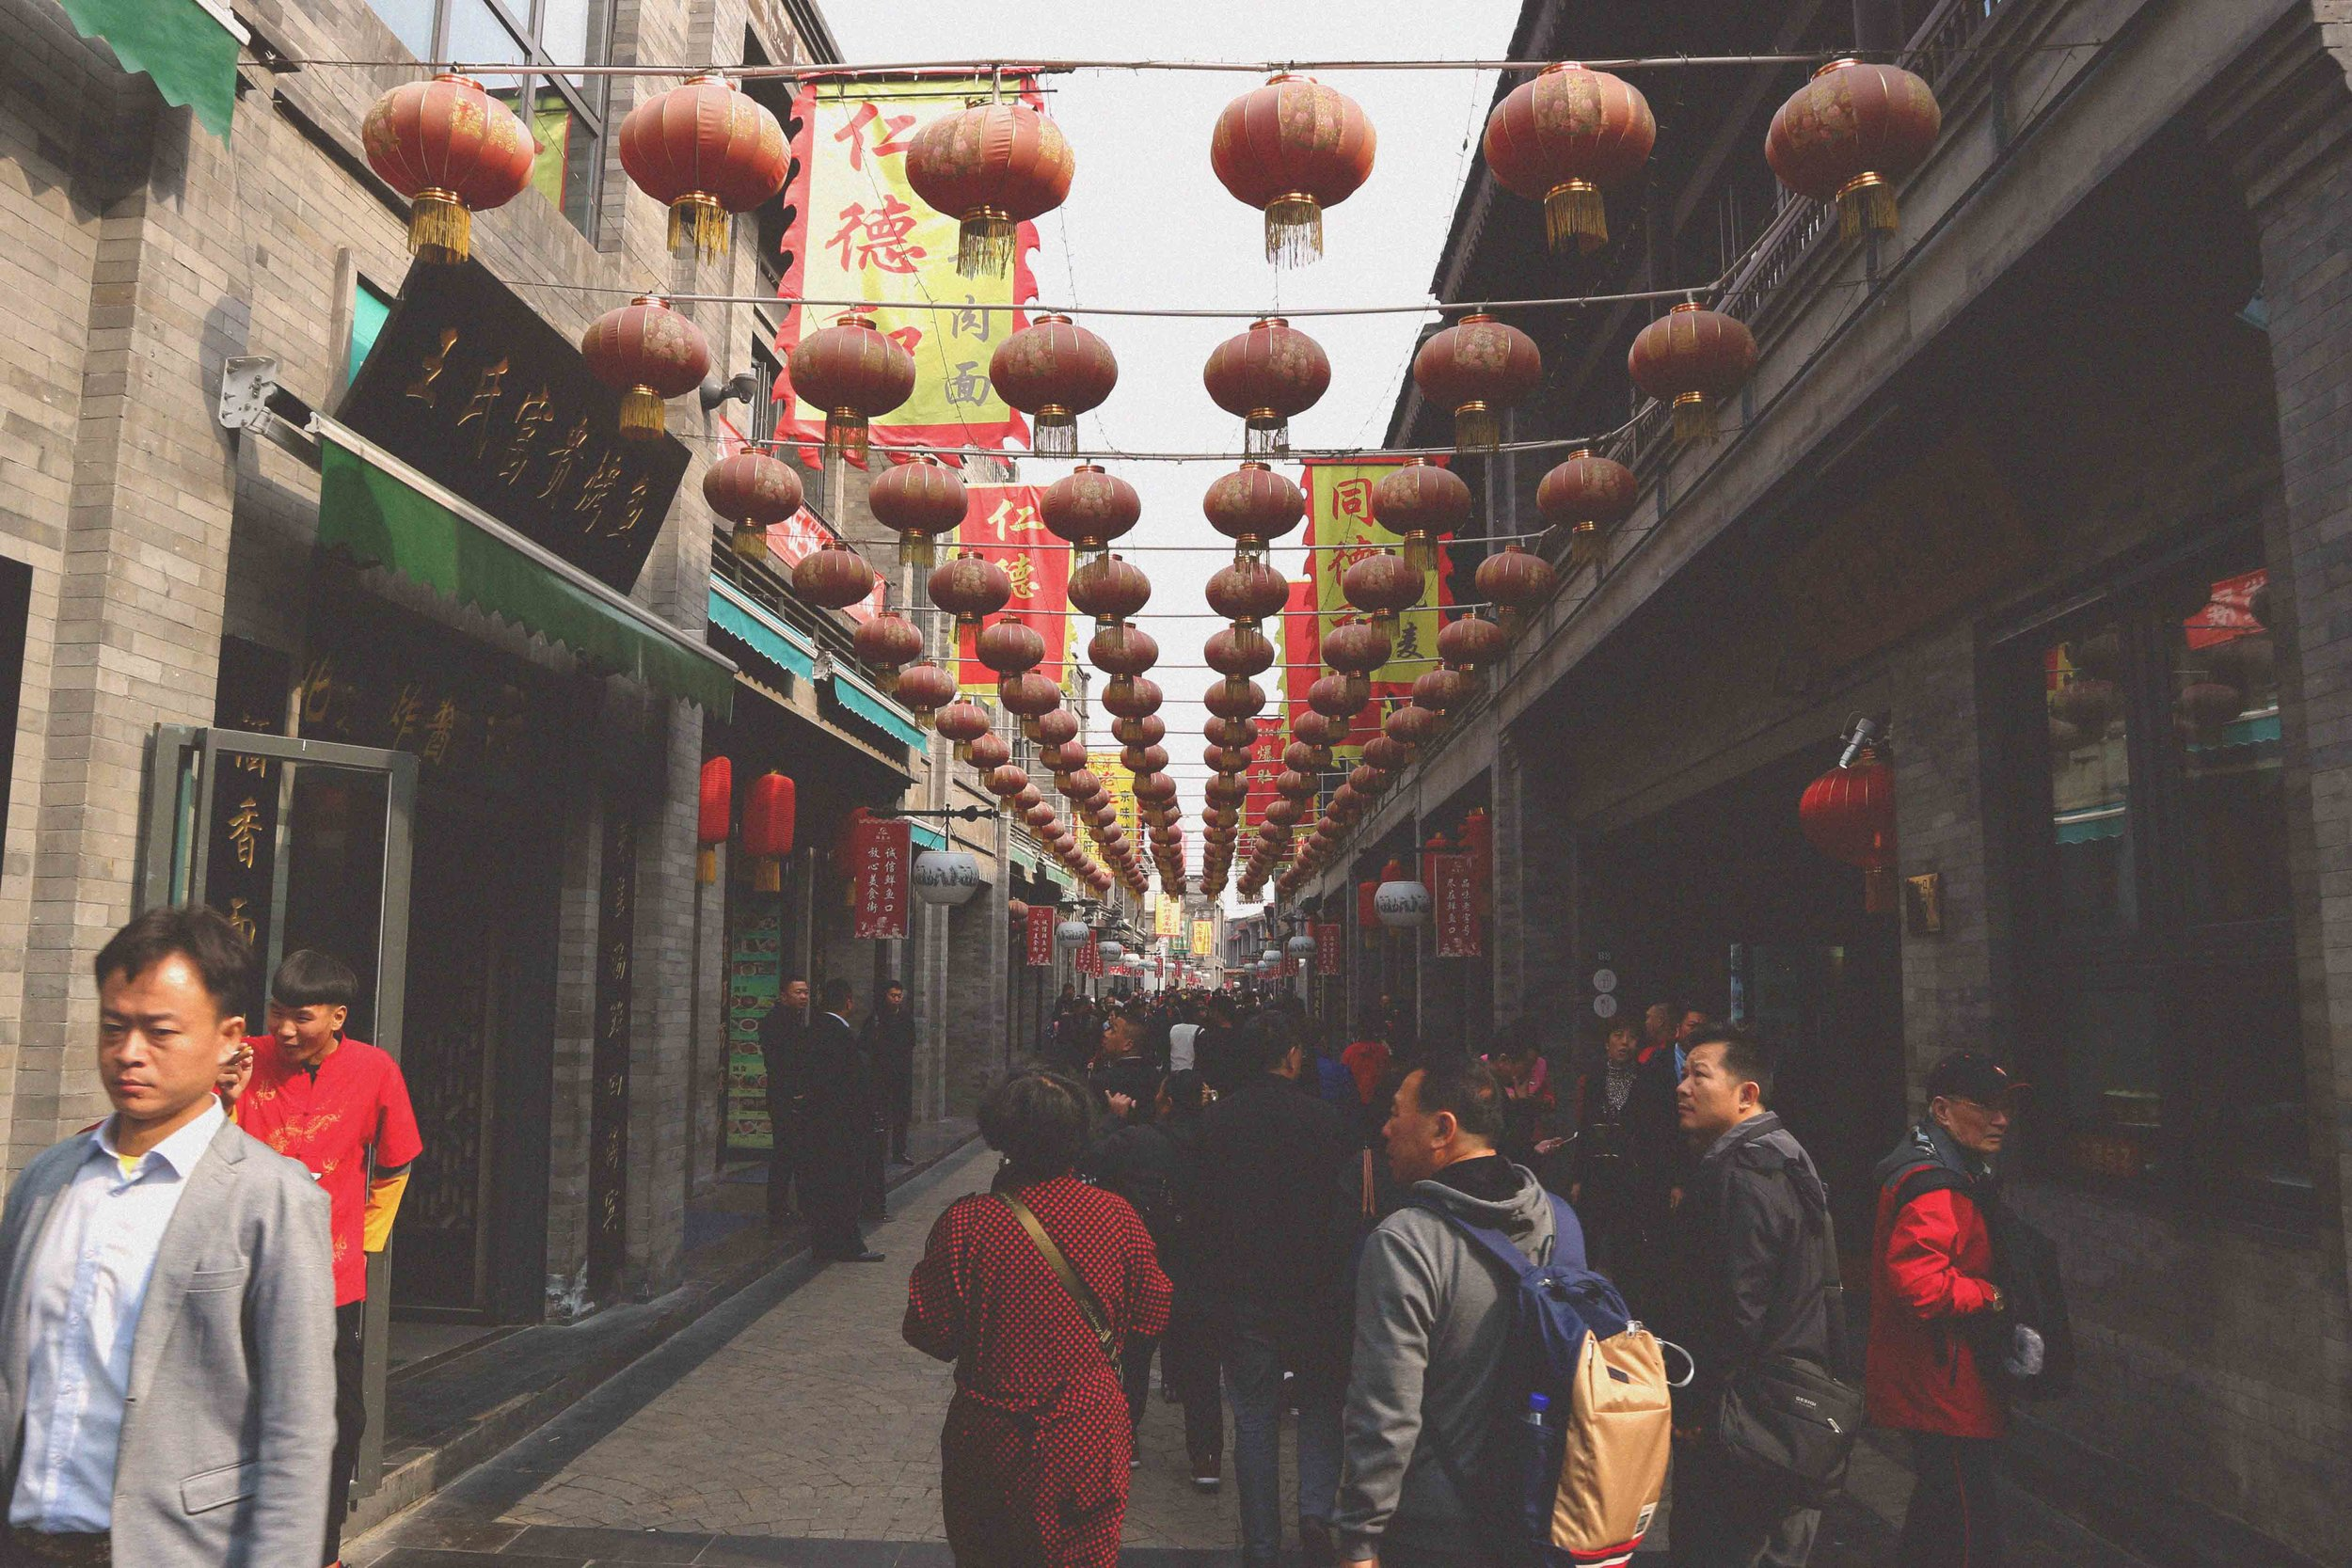 The Quianmen shopping area